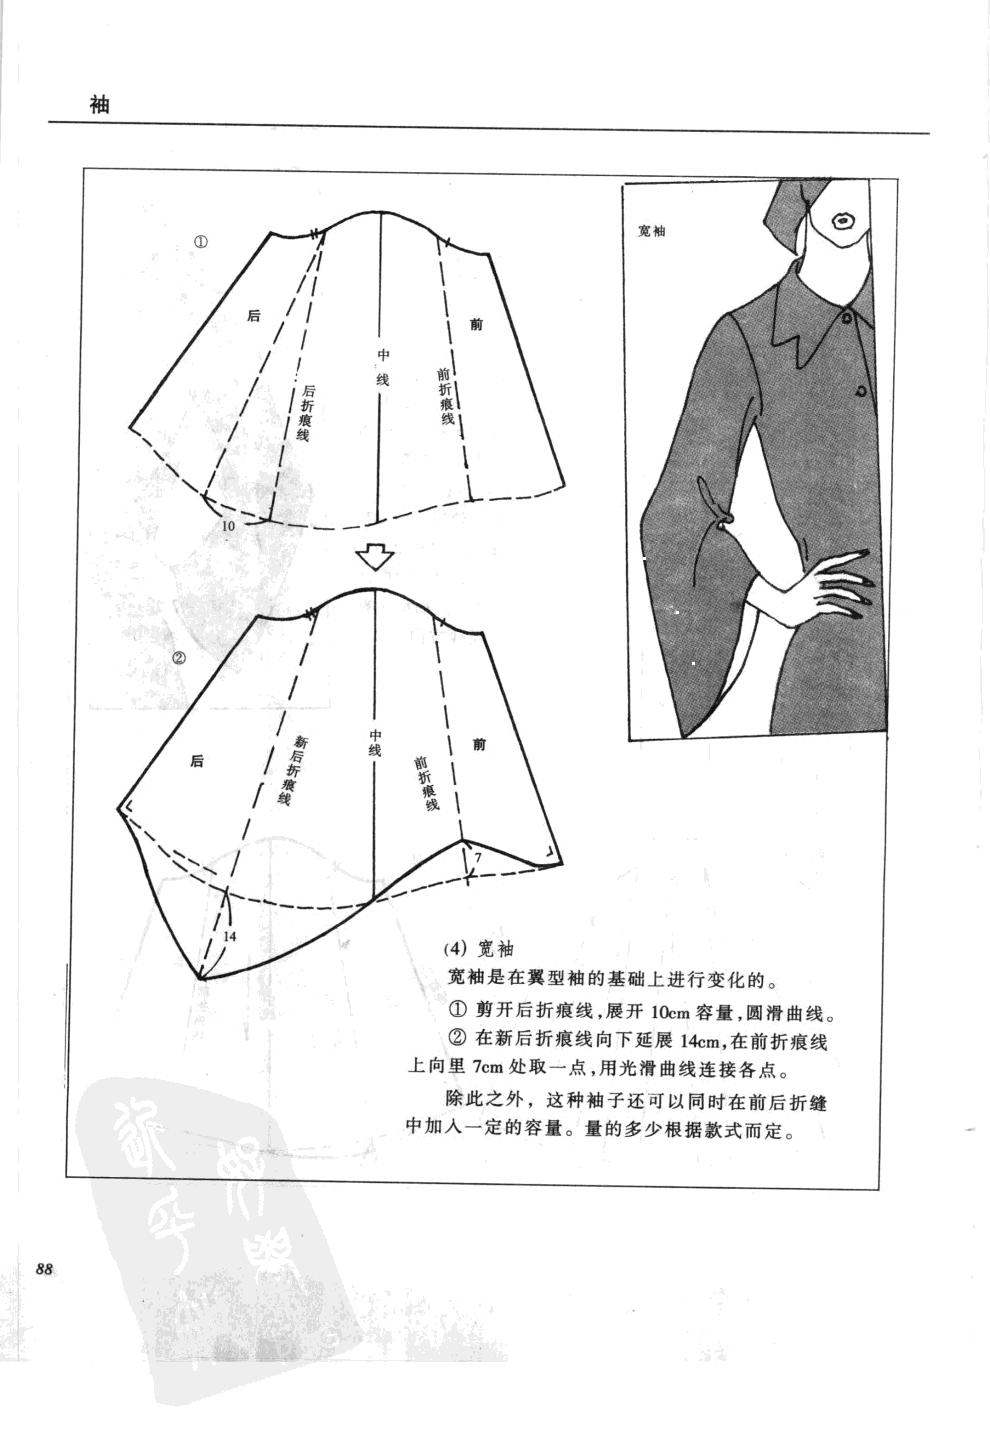 Pin by Nati on для констр модели | Costura, Patrones de costura ...